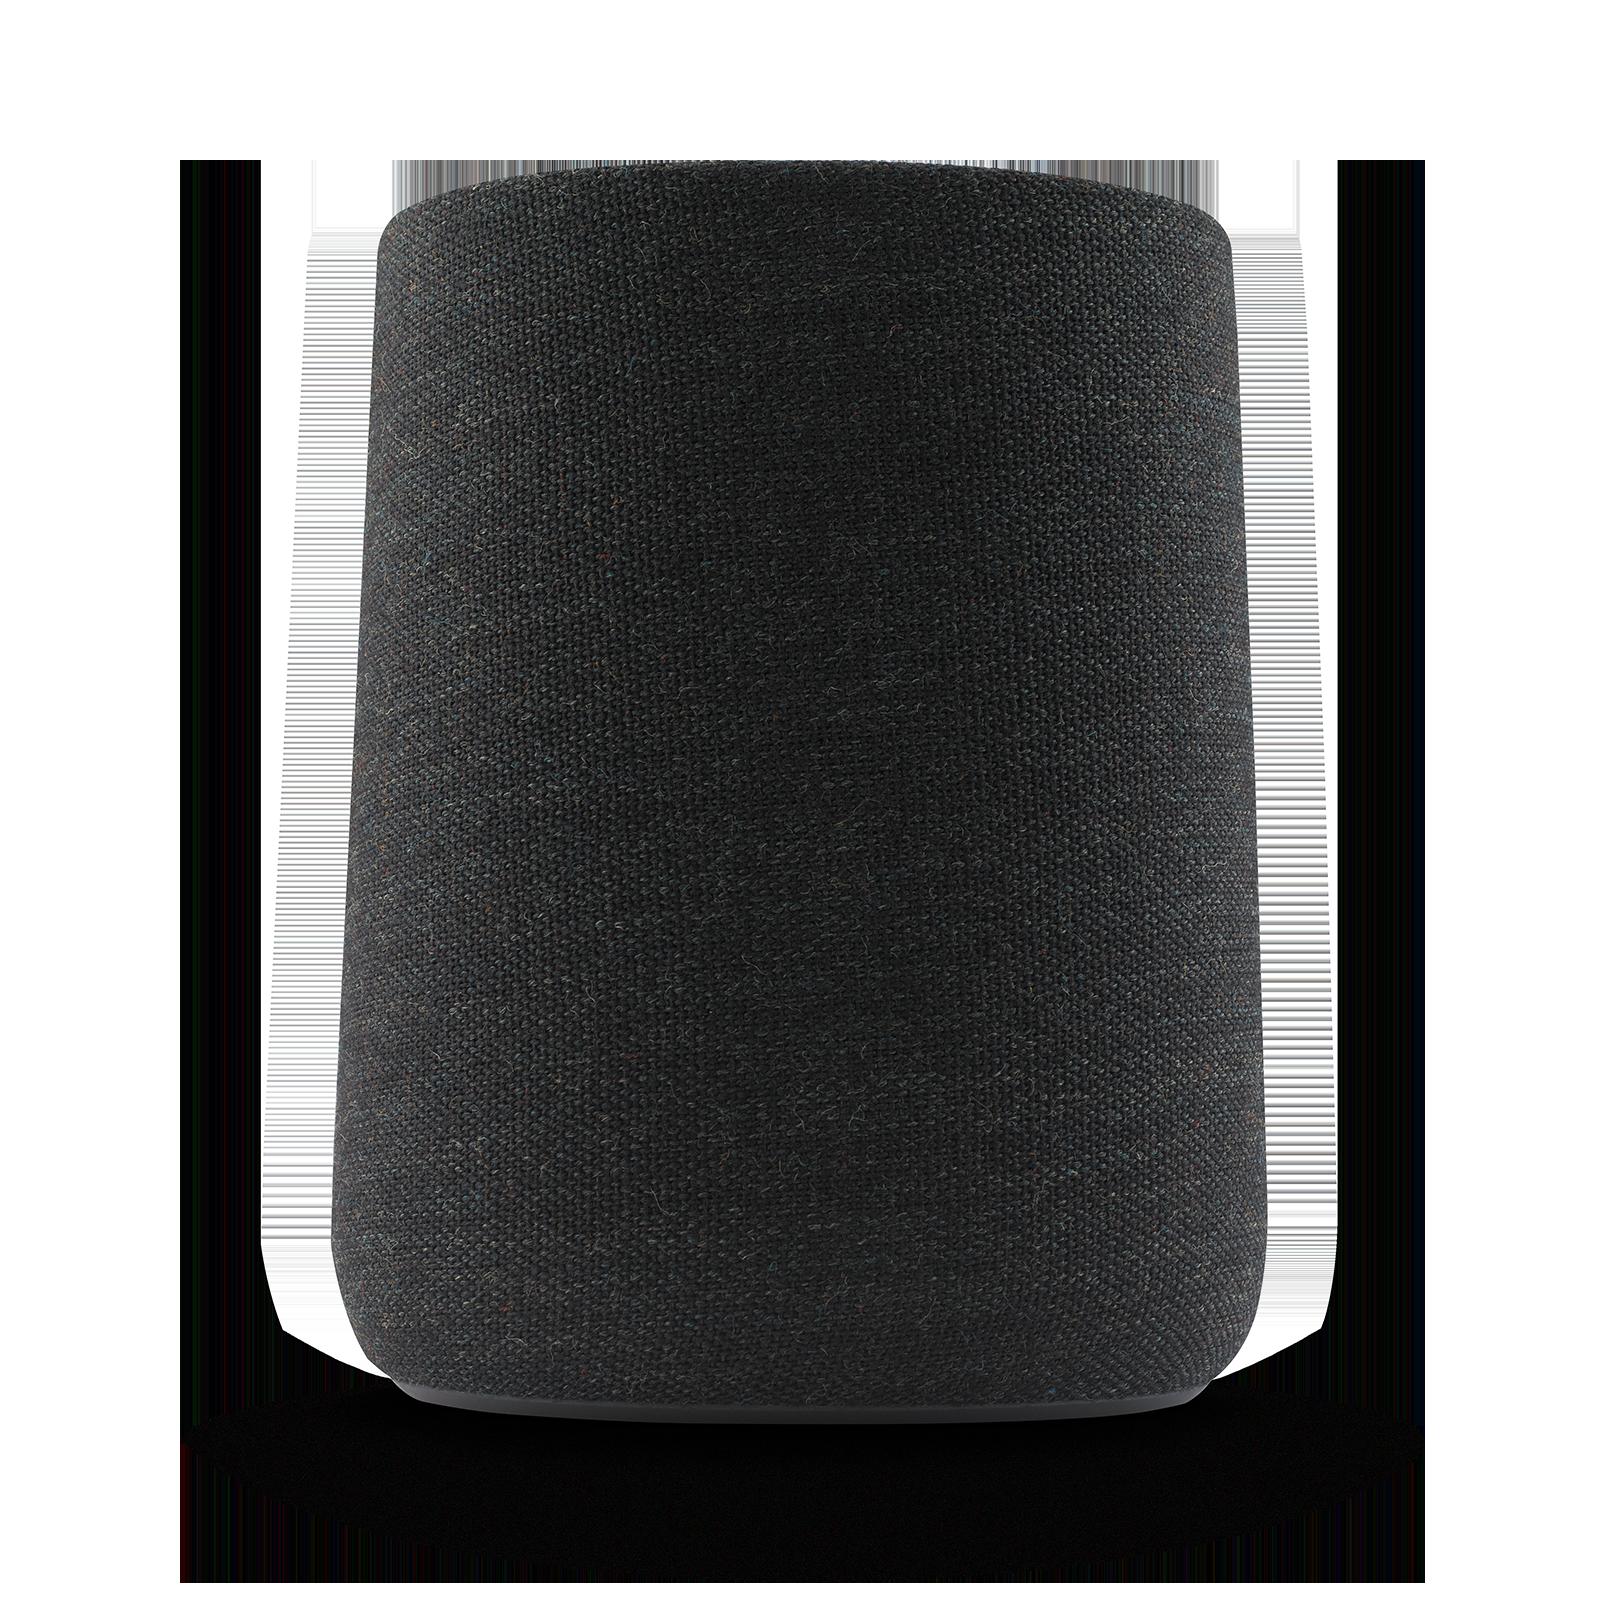 Harman Kardon Citation ONE - Black - Compact, smart and amazing sound - Detailshot 1